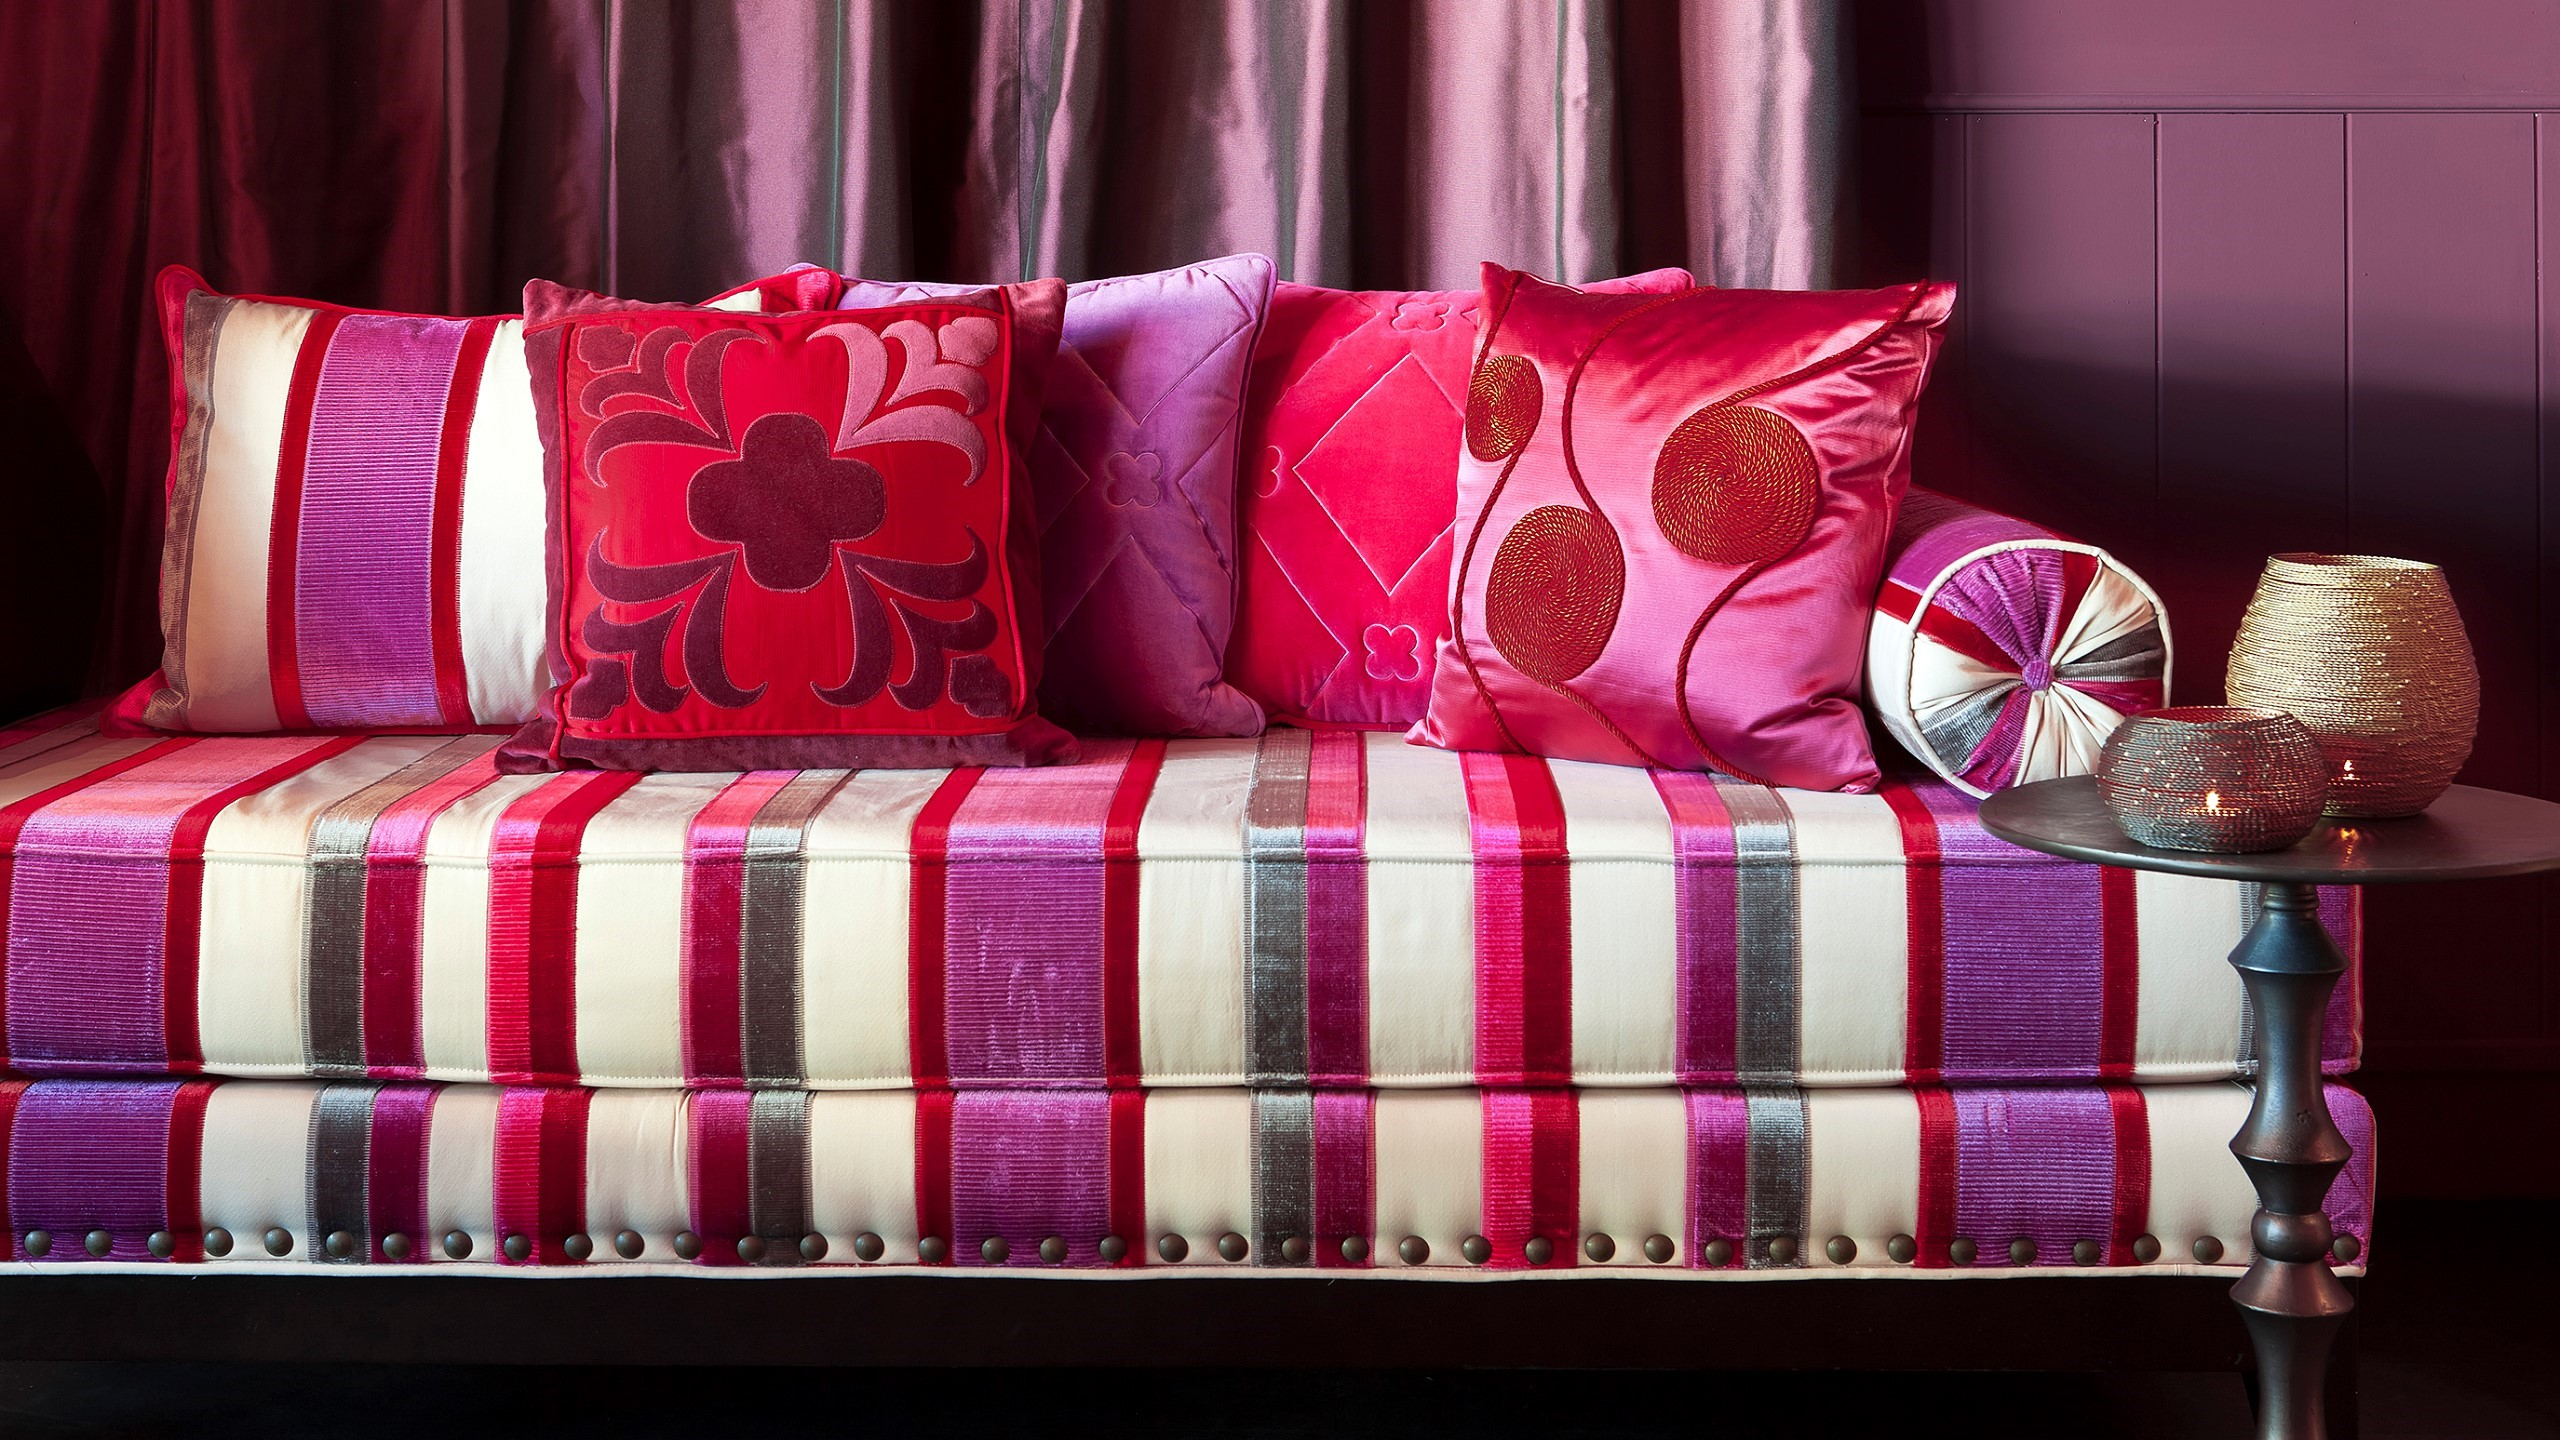 faltrollos peter reinhardt ihre raumausstattung zum. Black Bedroom Furniture Sets. Home Design Ideas